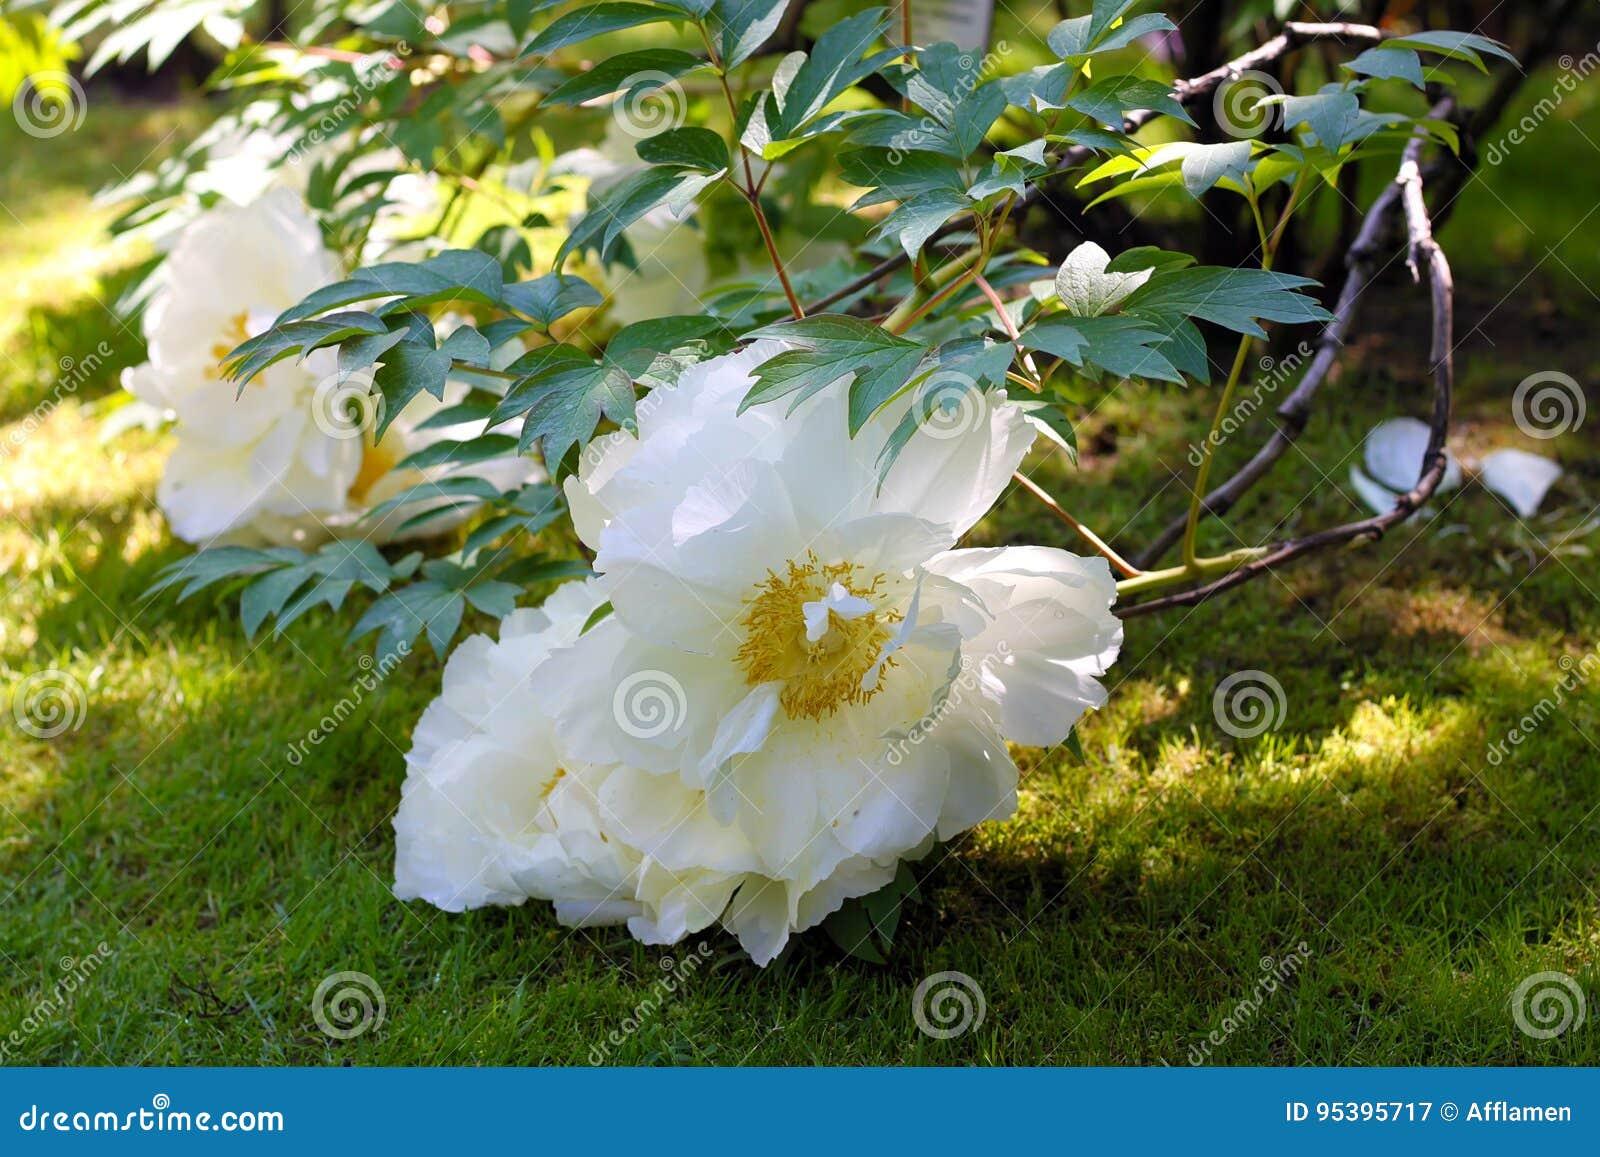 Big White Flowers Of Paeonia Suffruticosa Stock Image Image Of